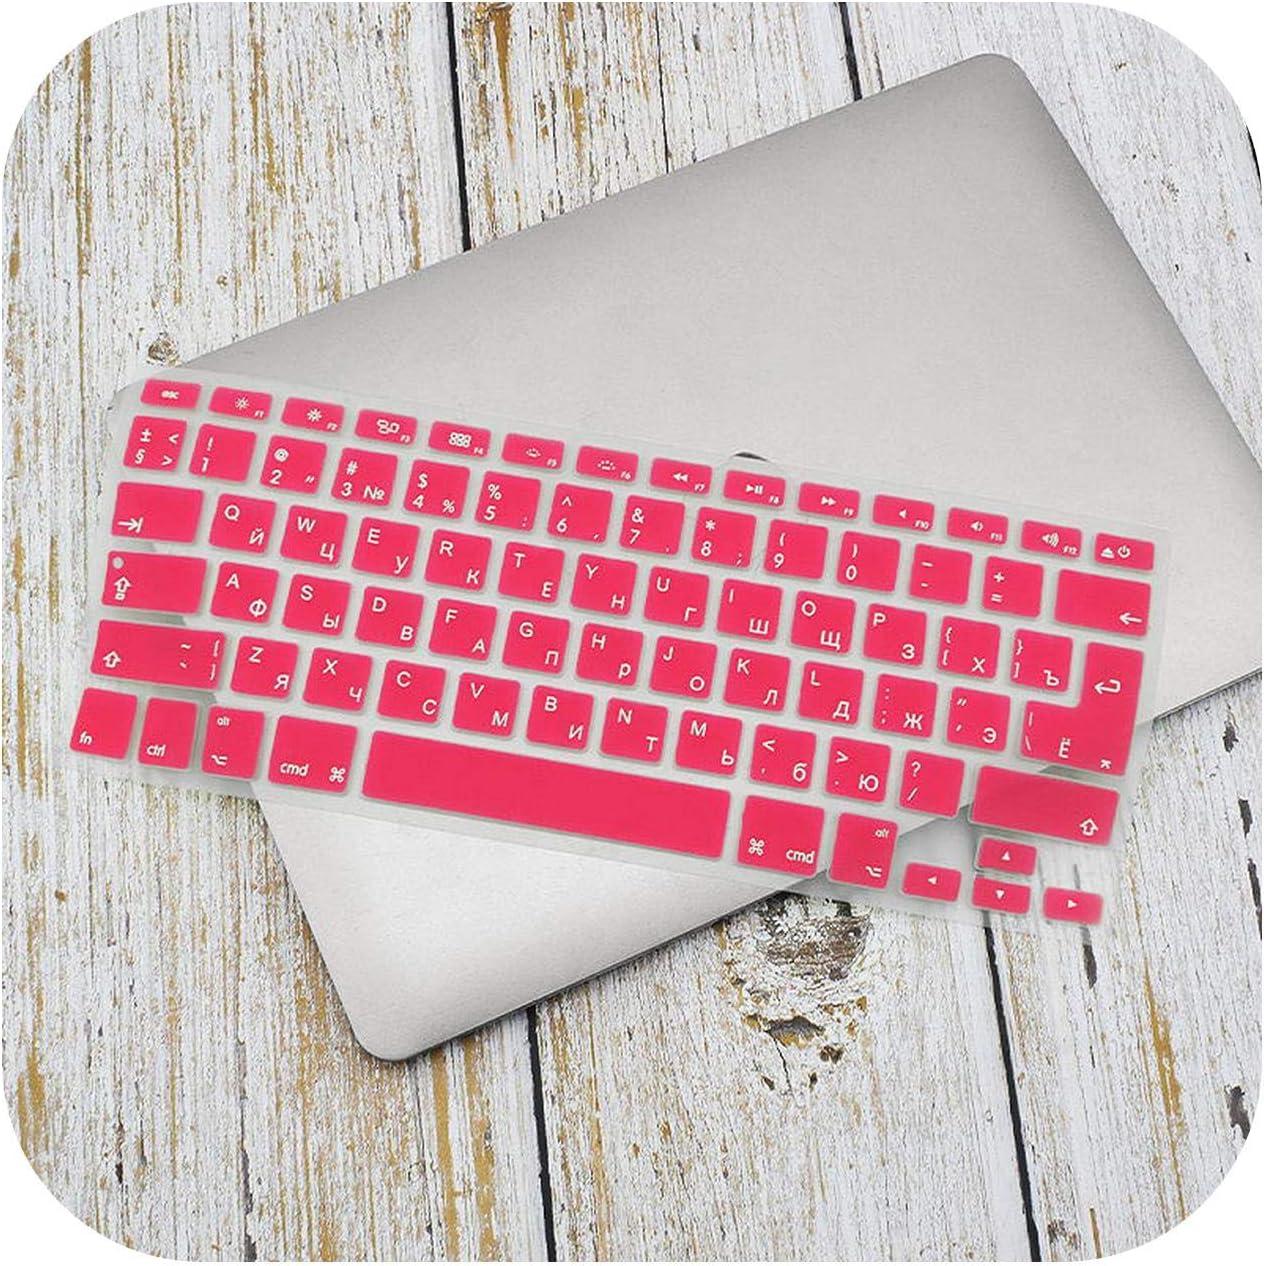 Russian English Keyboard Cover for MacBook Pro Air 13 15 Soft TPU Waterproof Keyboard Stickers for MacBook EU US 13 15-Purple